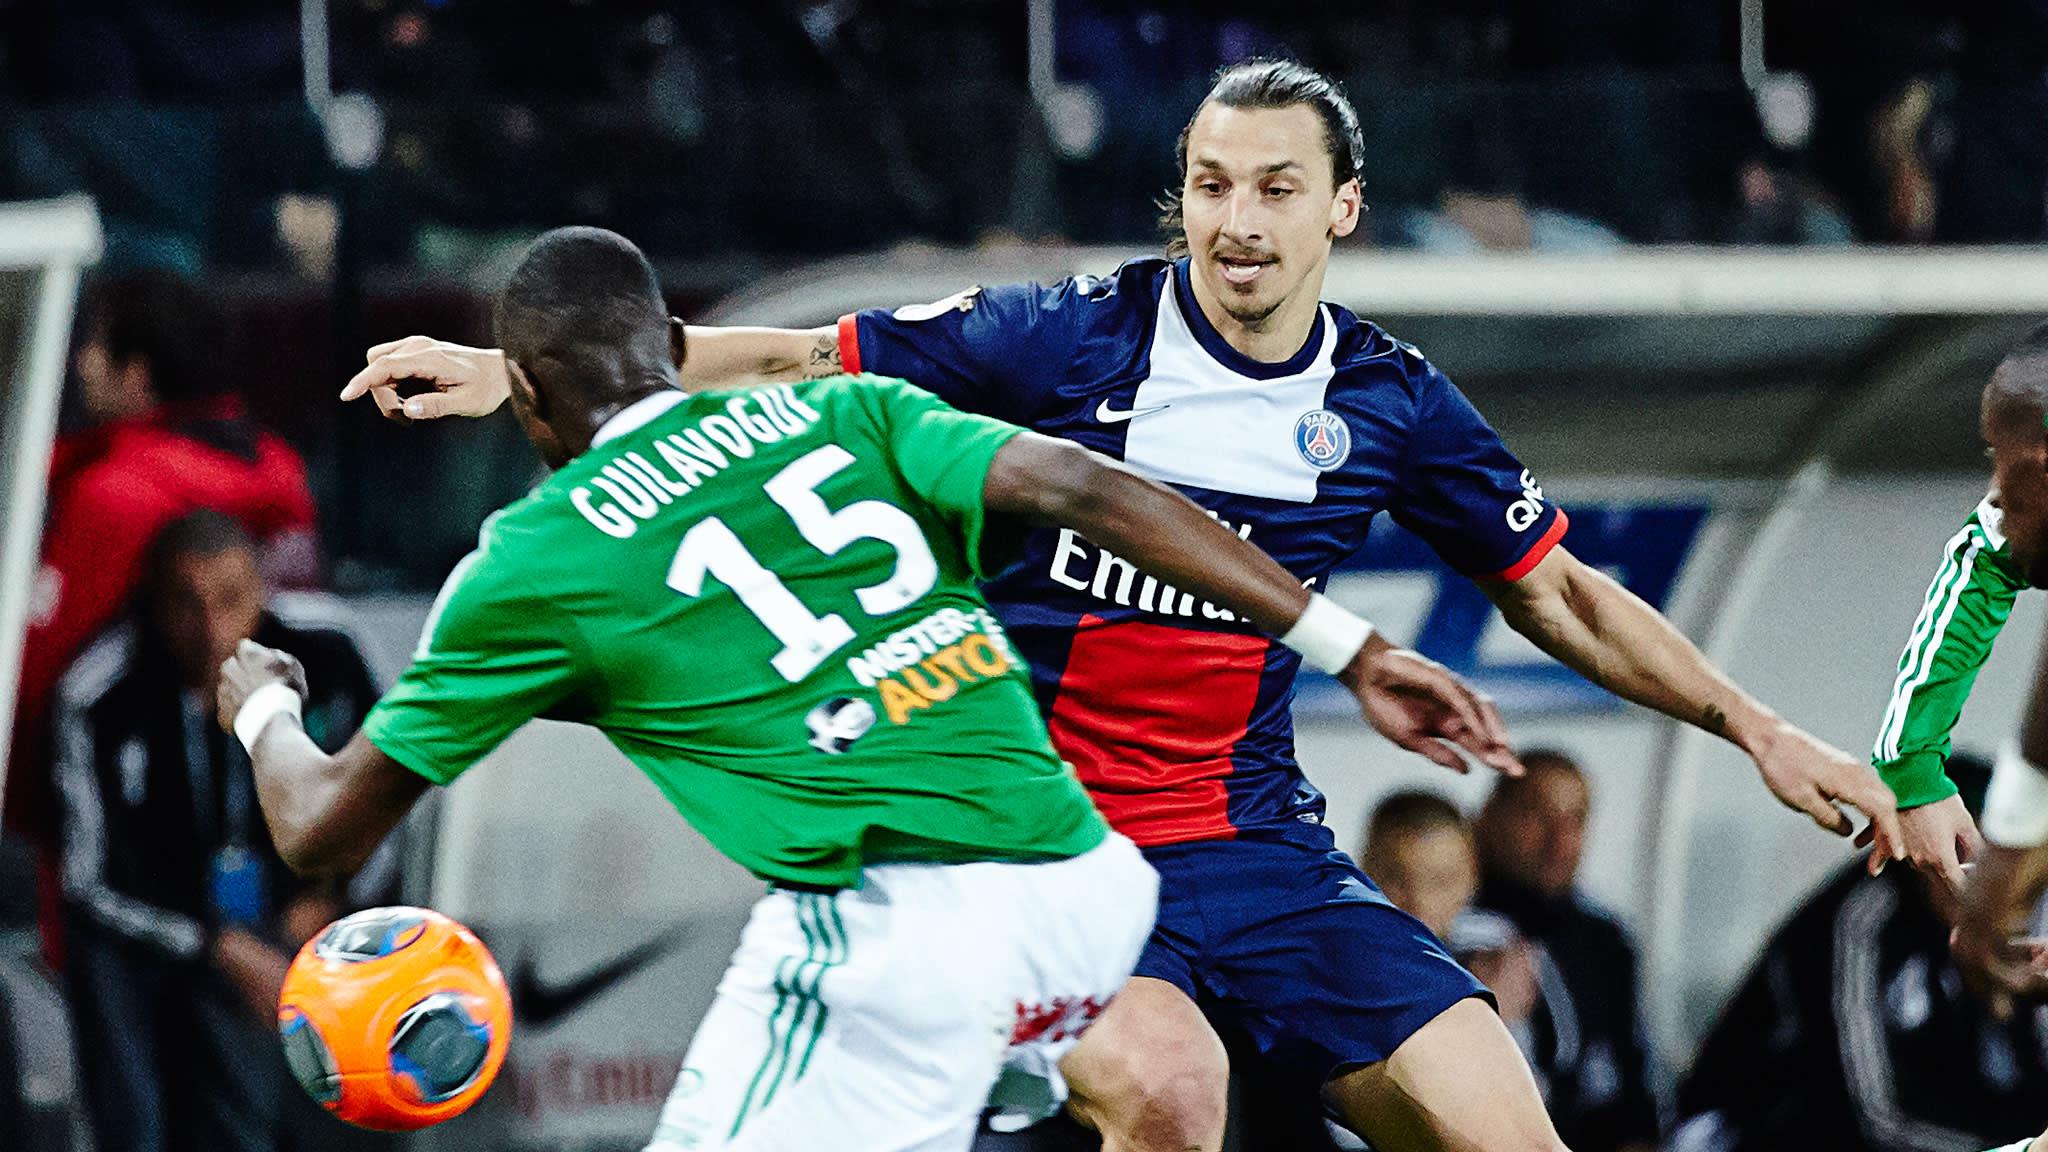 Can Paris Saint-Germain become the world's richest sports club?   Financial Times